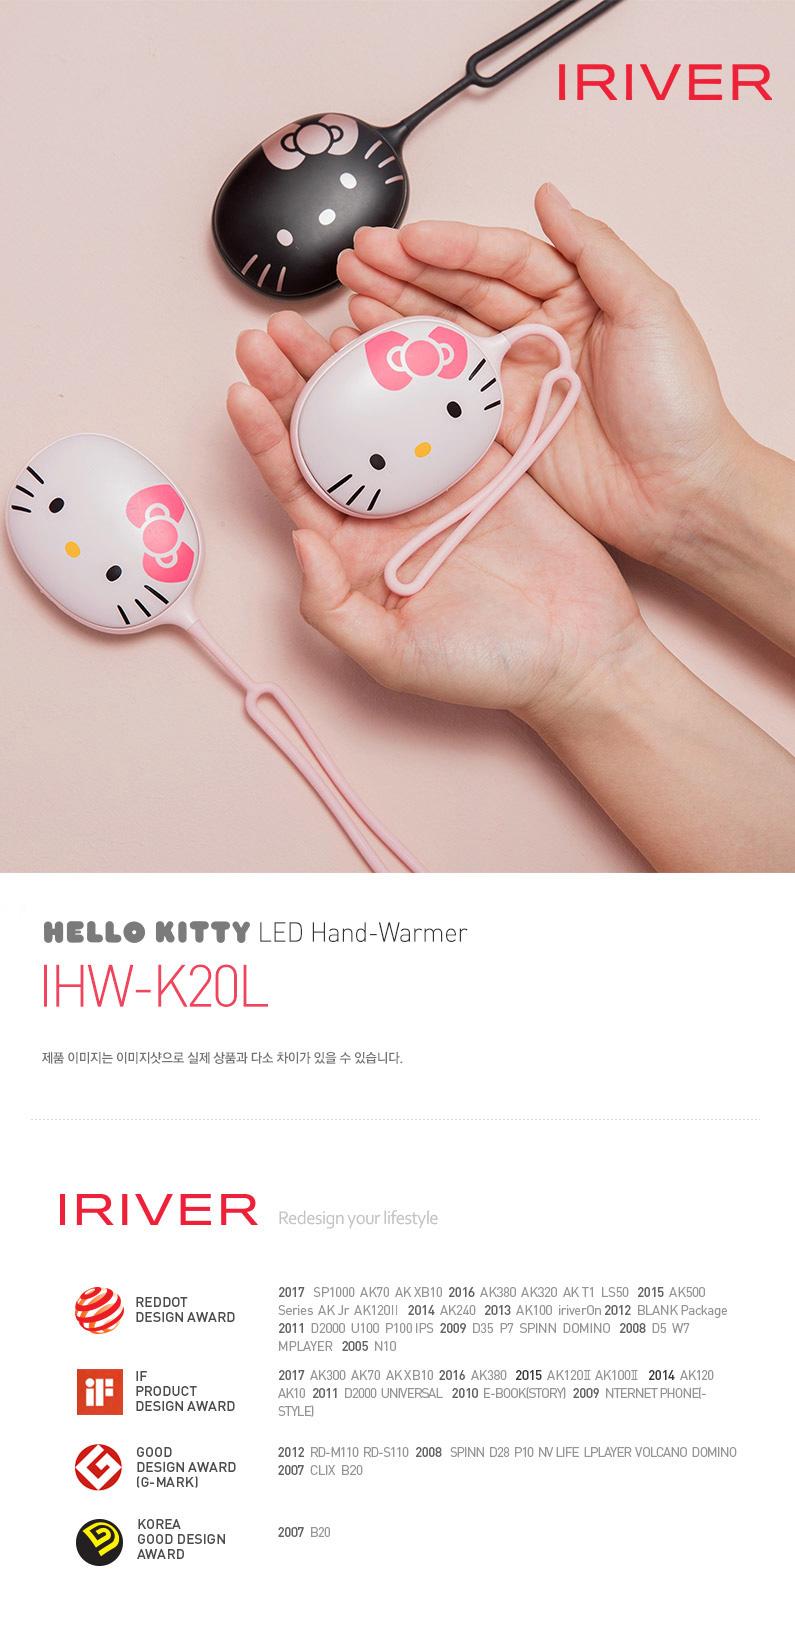 iriver-ihw-k20l-01-1-.jpg